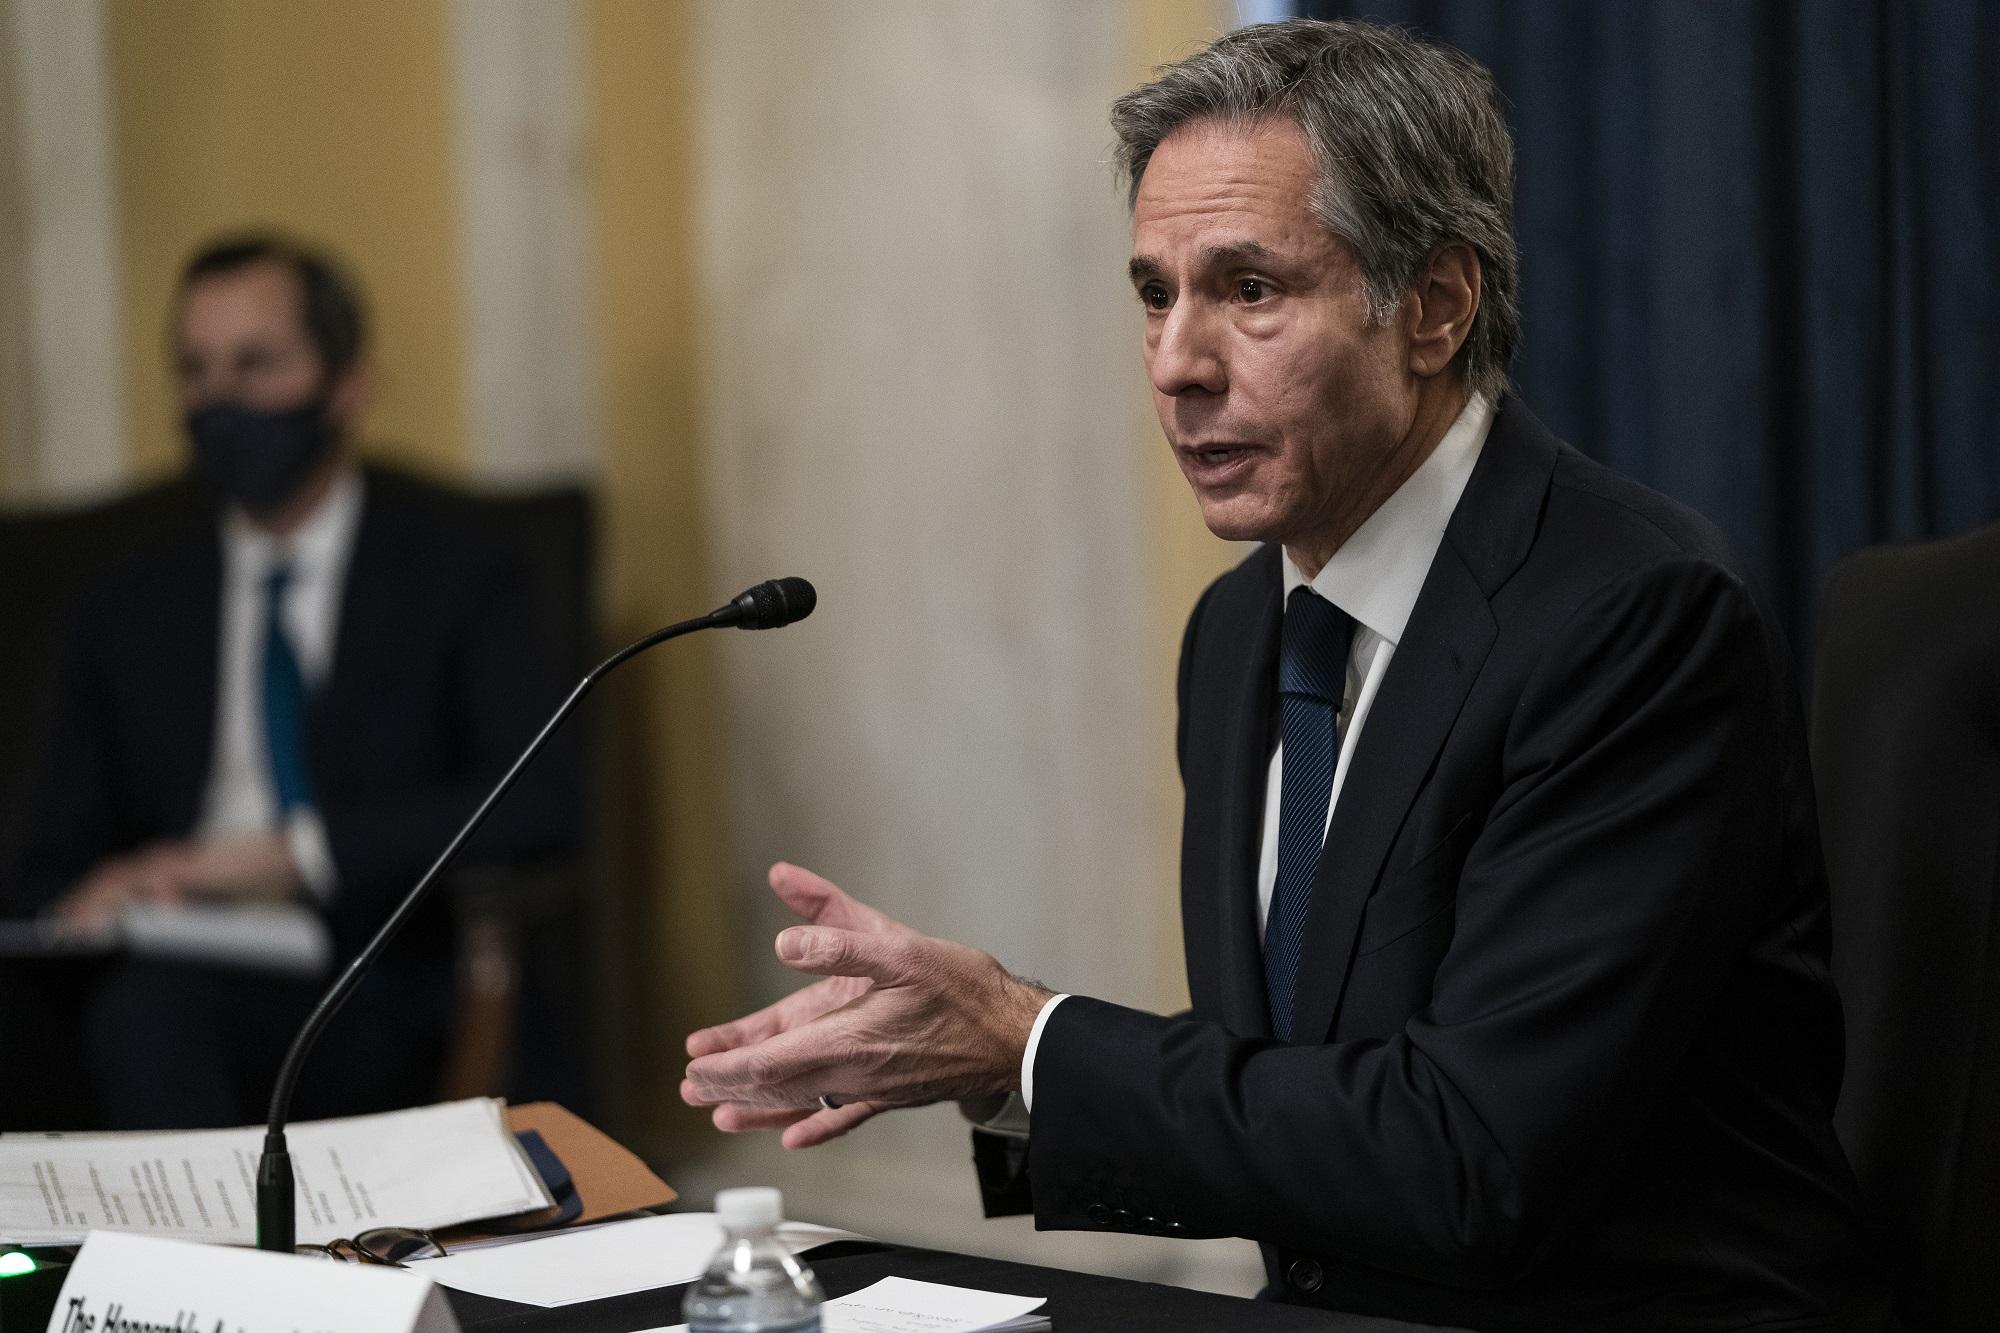 US Secretary of State Antony Blinken has said Iran should make the first move (AFP)